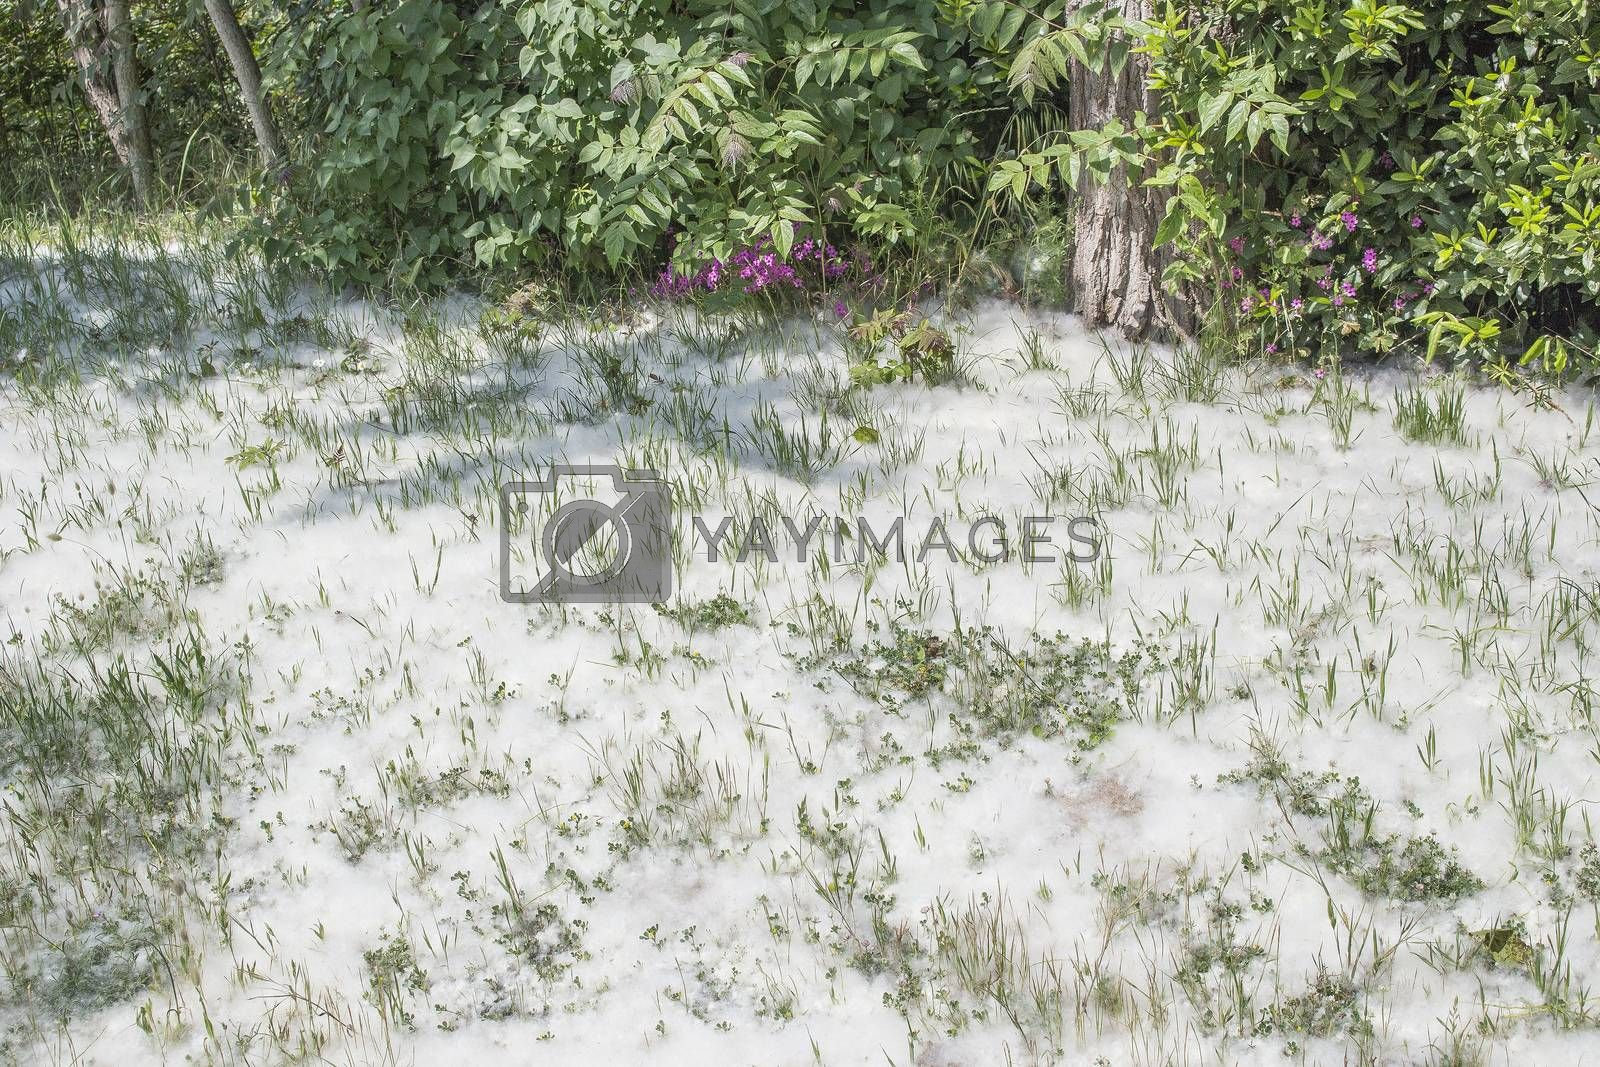 Poplar white snowlike hairs in the Pinewood forest on the Pialassa della Baiona brackish lagoon near Marina Romea along te  Adriatic seaside in Ravenna (Italy)